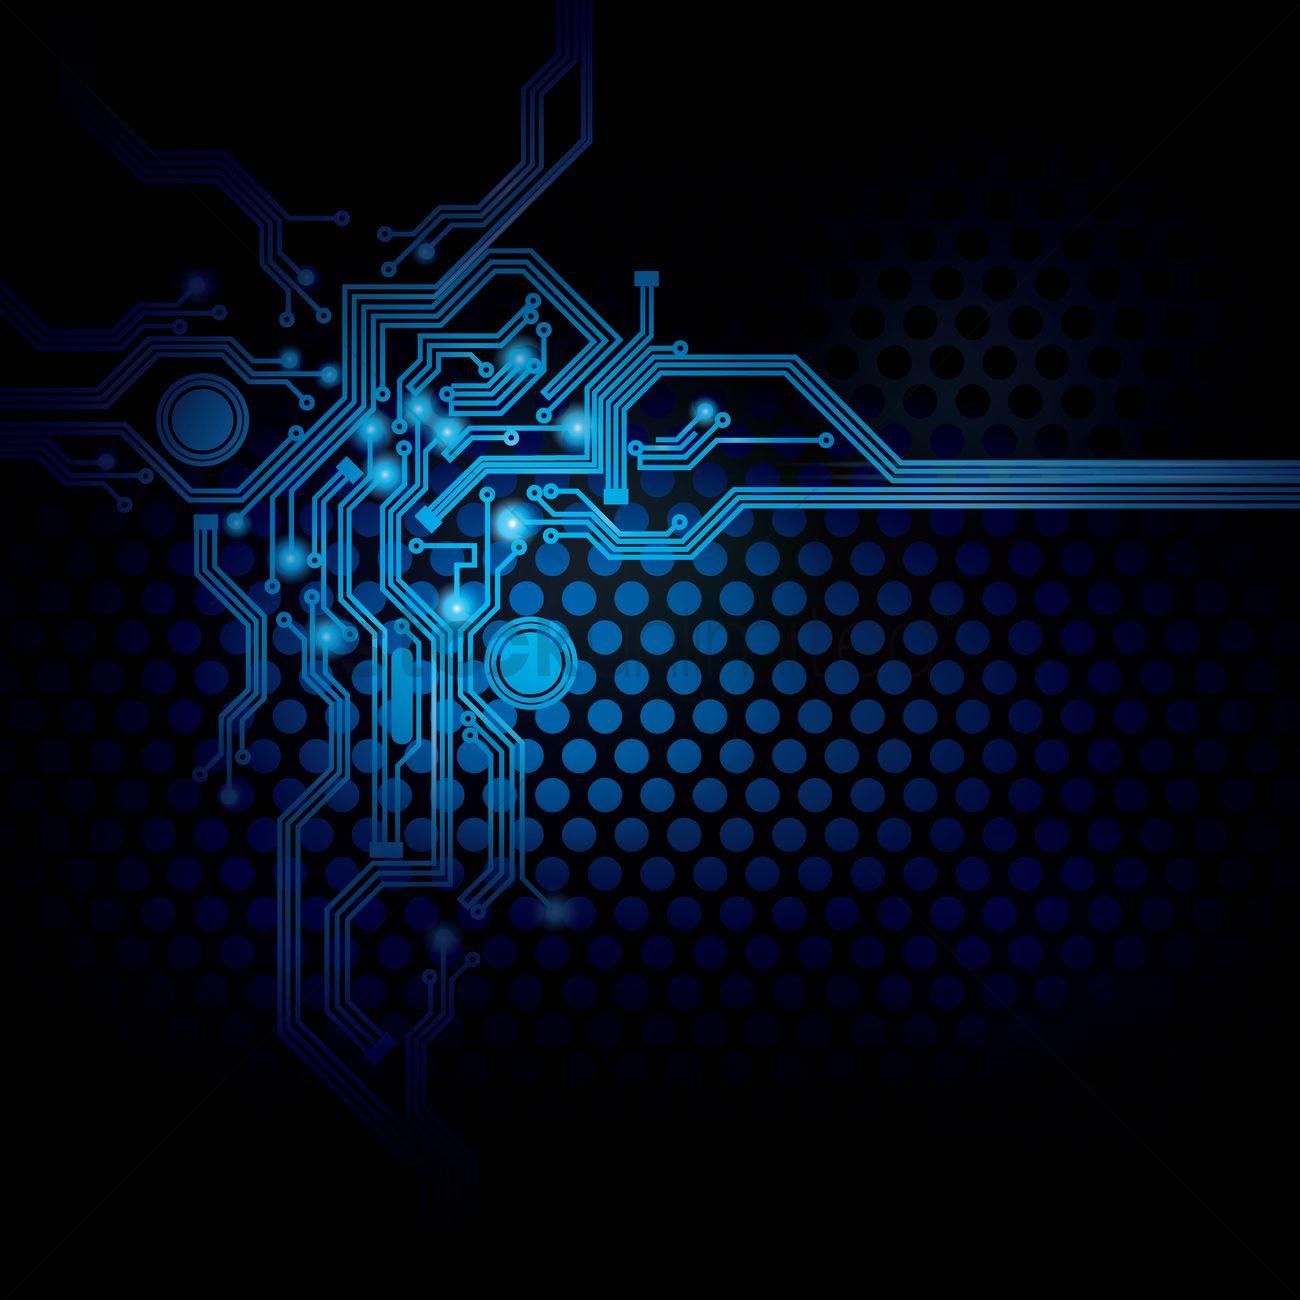 1300x1300 Circuit Design On Digital Background Vector Image